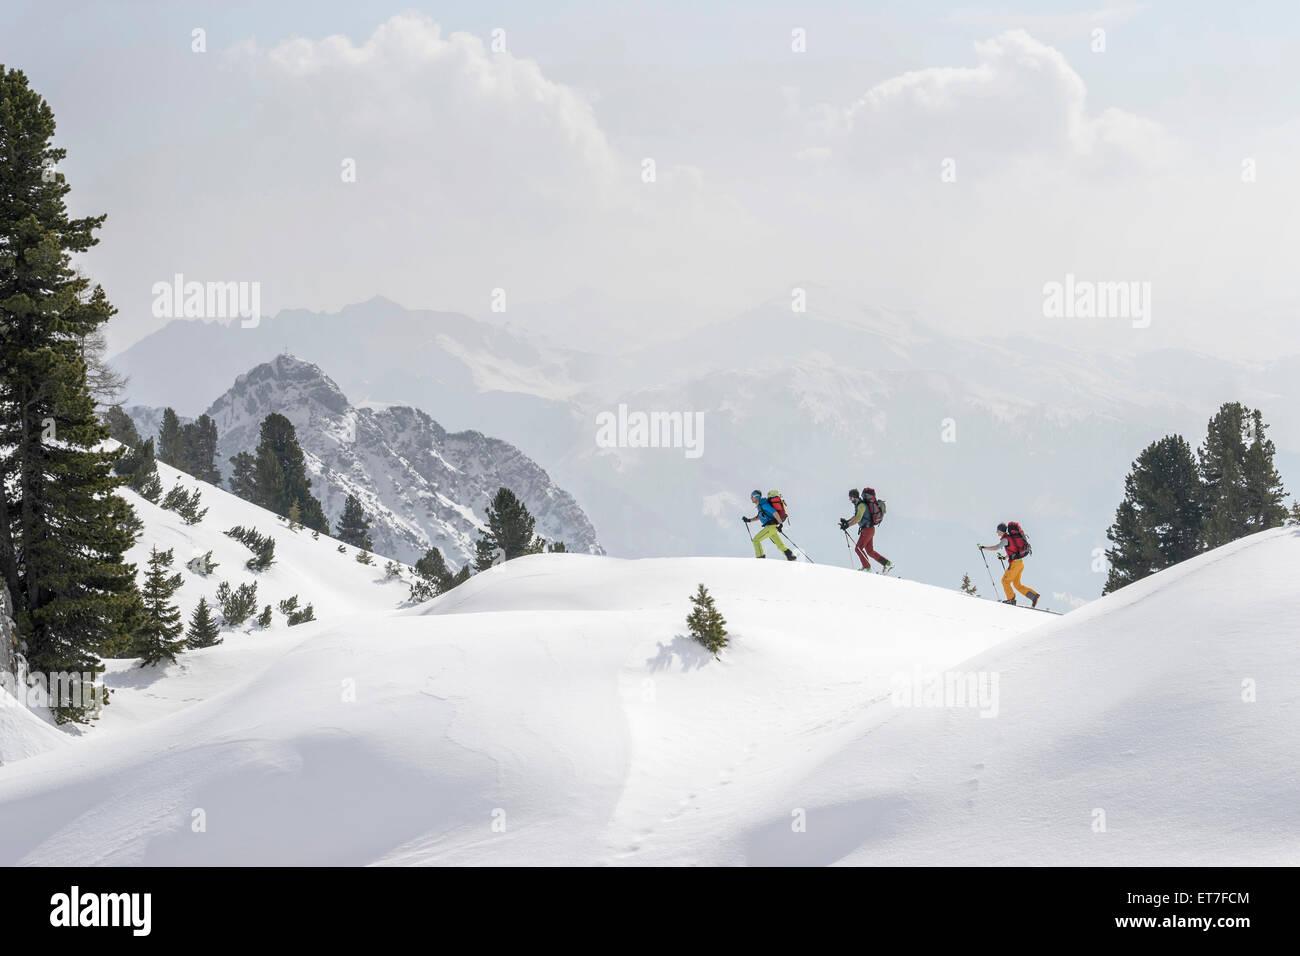 Ski mountaineers climbing on snowy peak, Tyrol, Austria - Stock Image